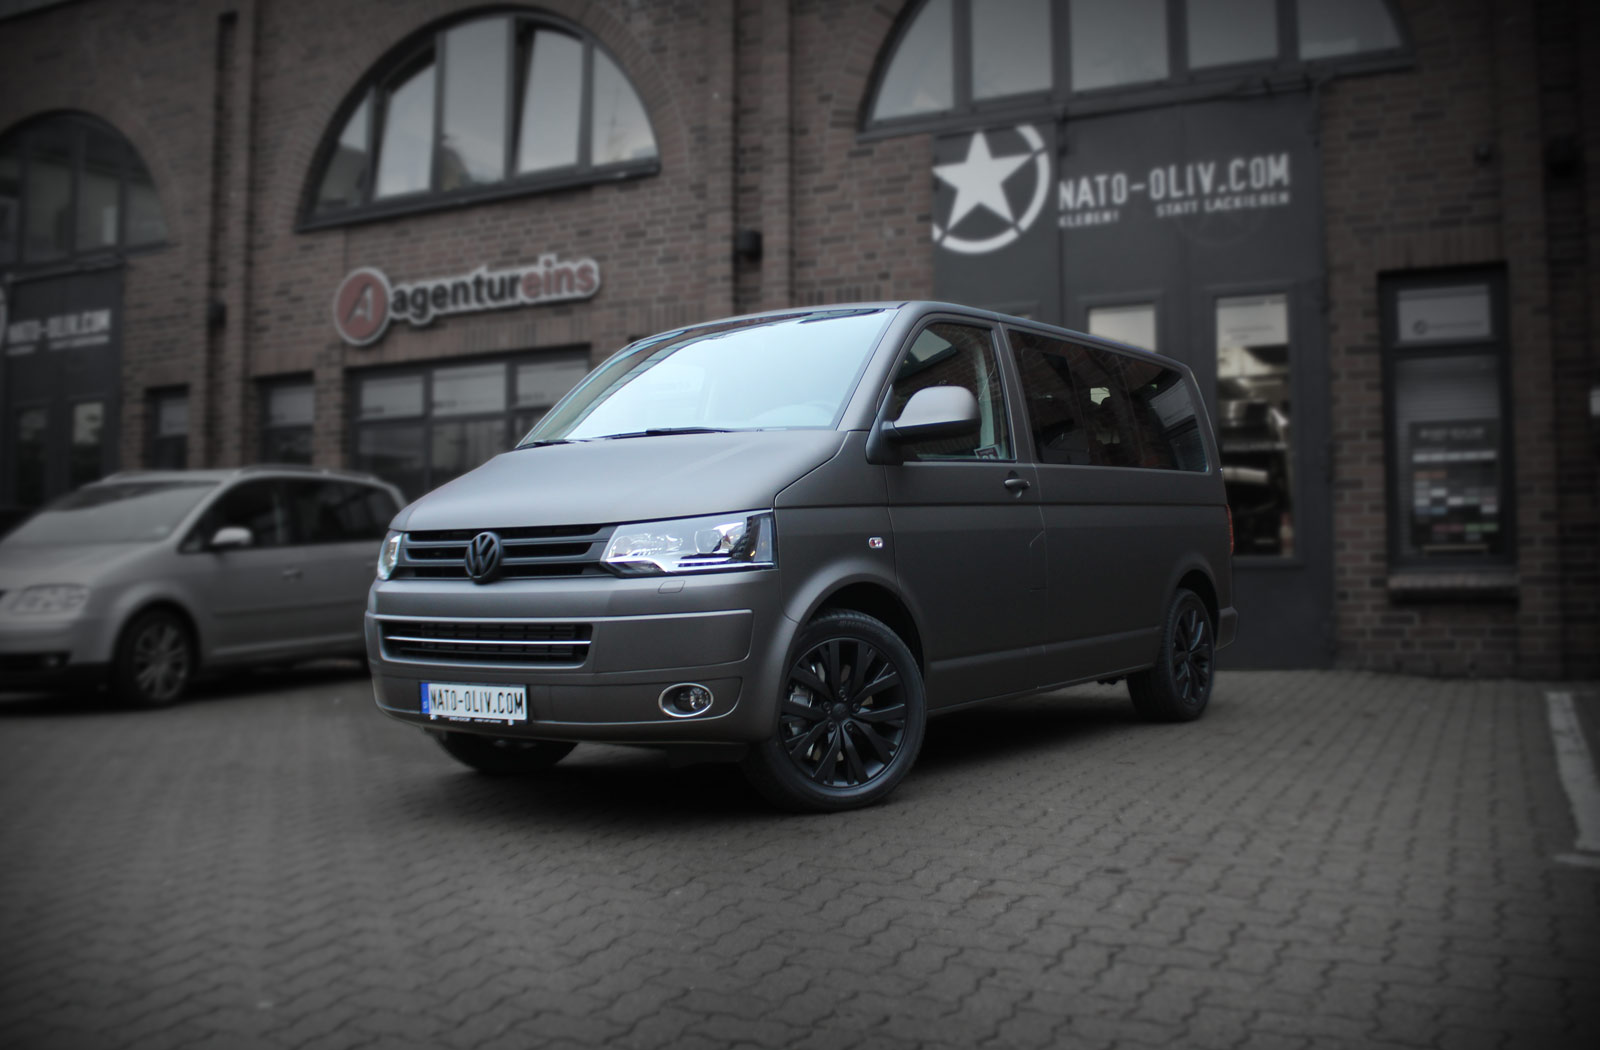 VW T5 Multivan mit Fahrradträger Schutzfolie und kompletter Folierung in Charcoal matt metallic.